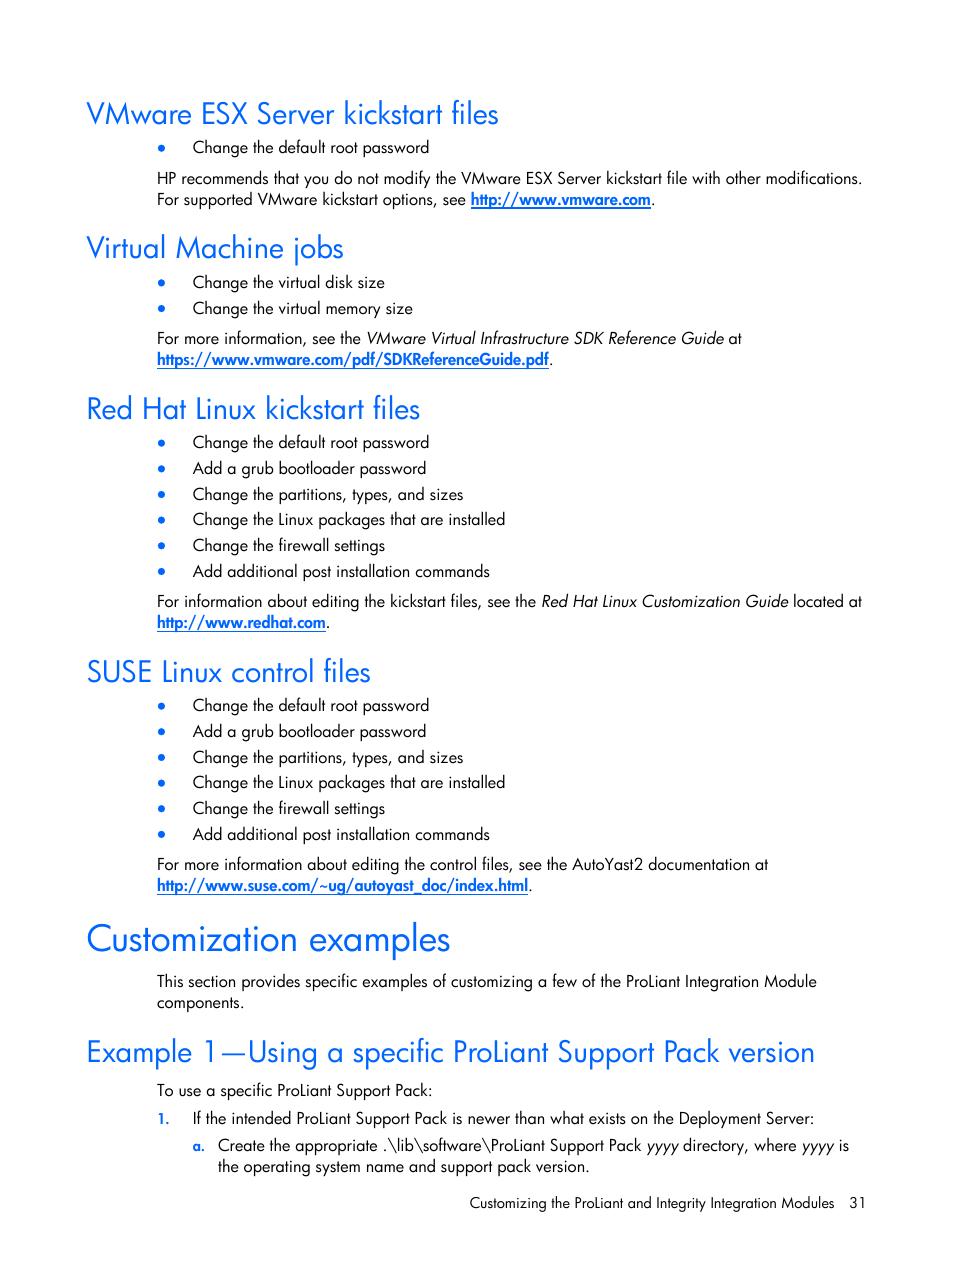 Vmware esx server kickstart files, Virtual machine jobs, Red hat